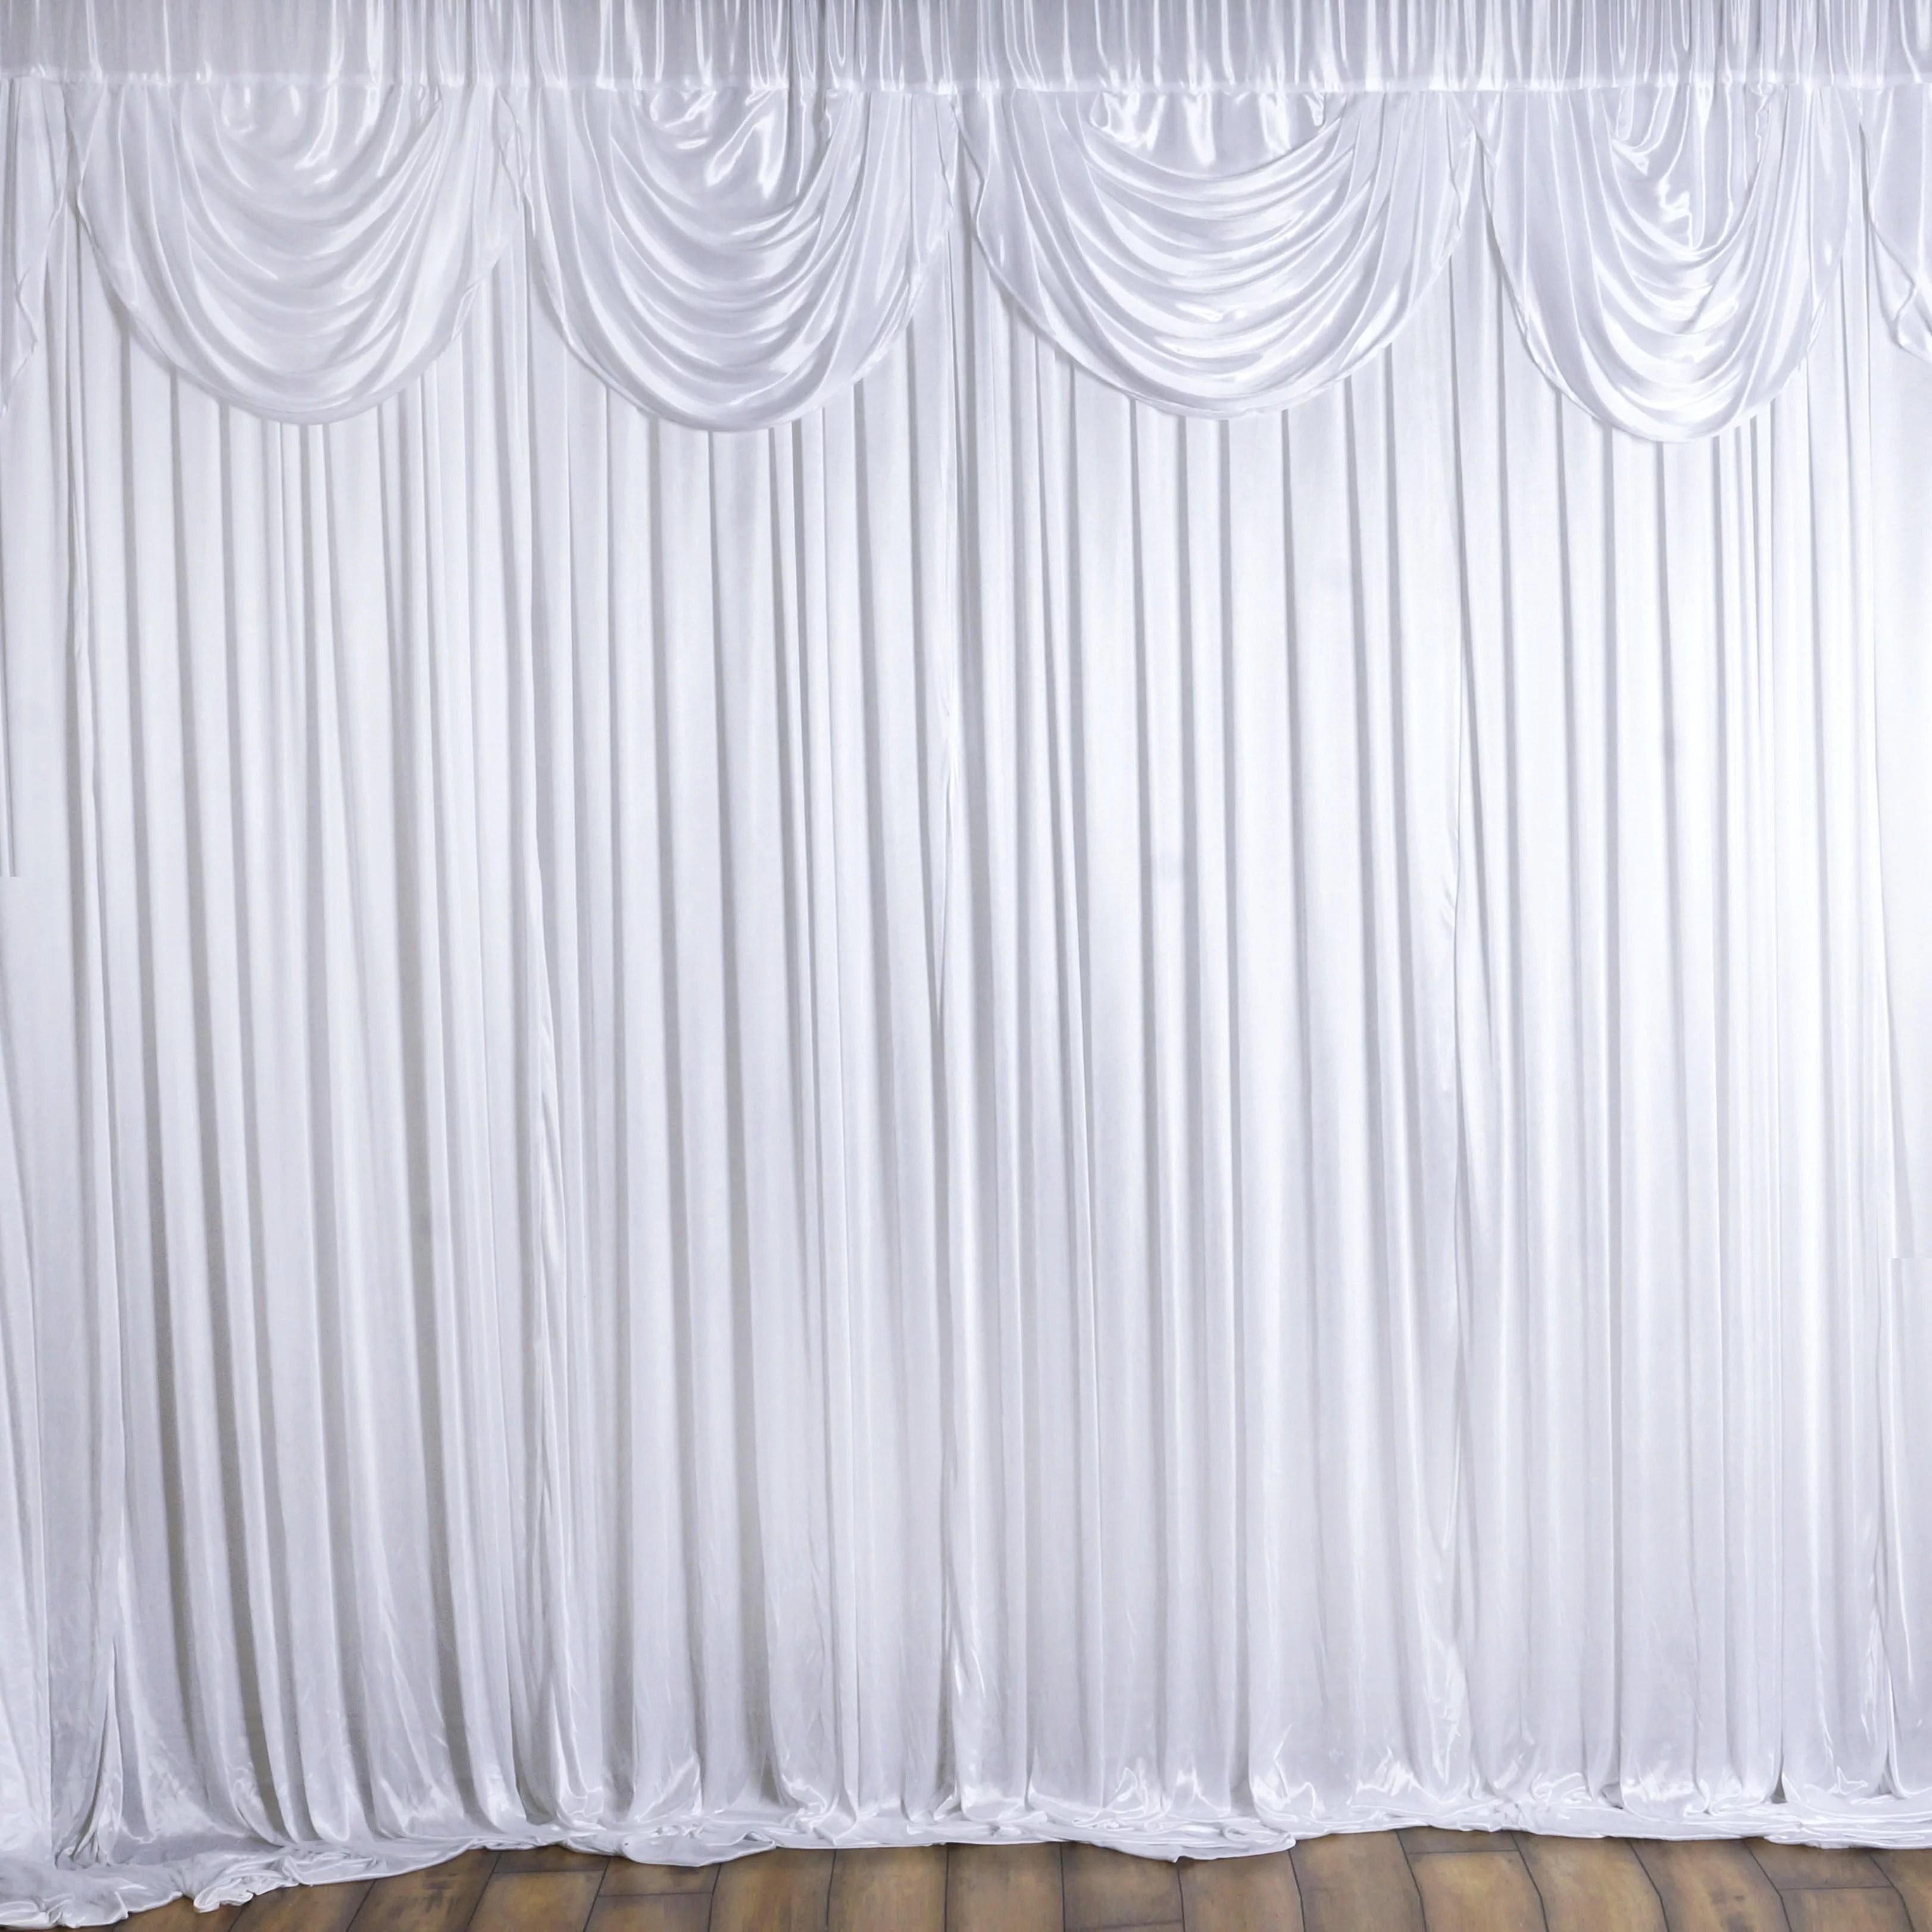 balsacircle white 20 feet x 10 feet decorative draping backdrop curtain wedding party photobooth ceremony event photo decorations walmart com